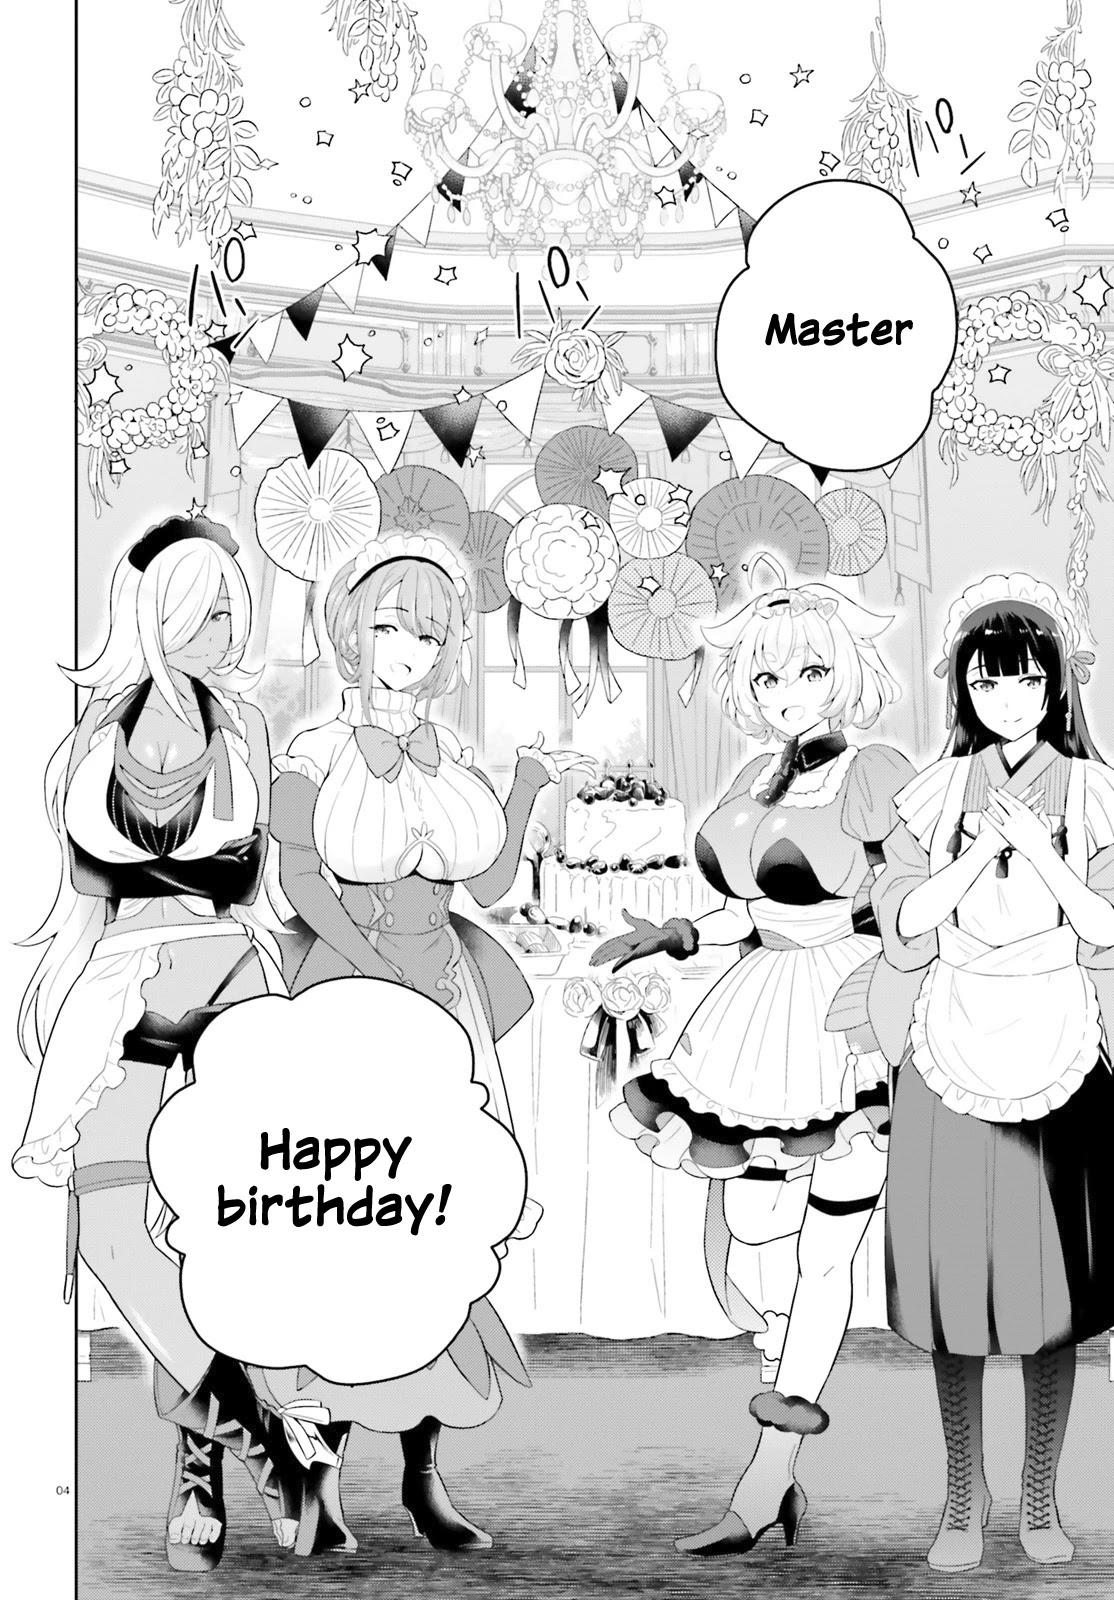 Shindou Yuusha To Maid Onee-San Chapter 13 page 5 - Mangakakalots.com